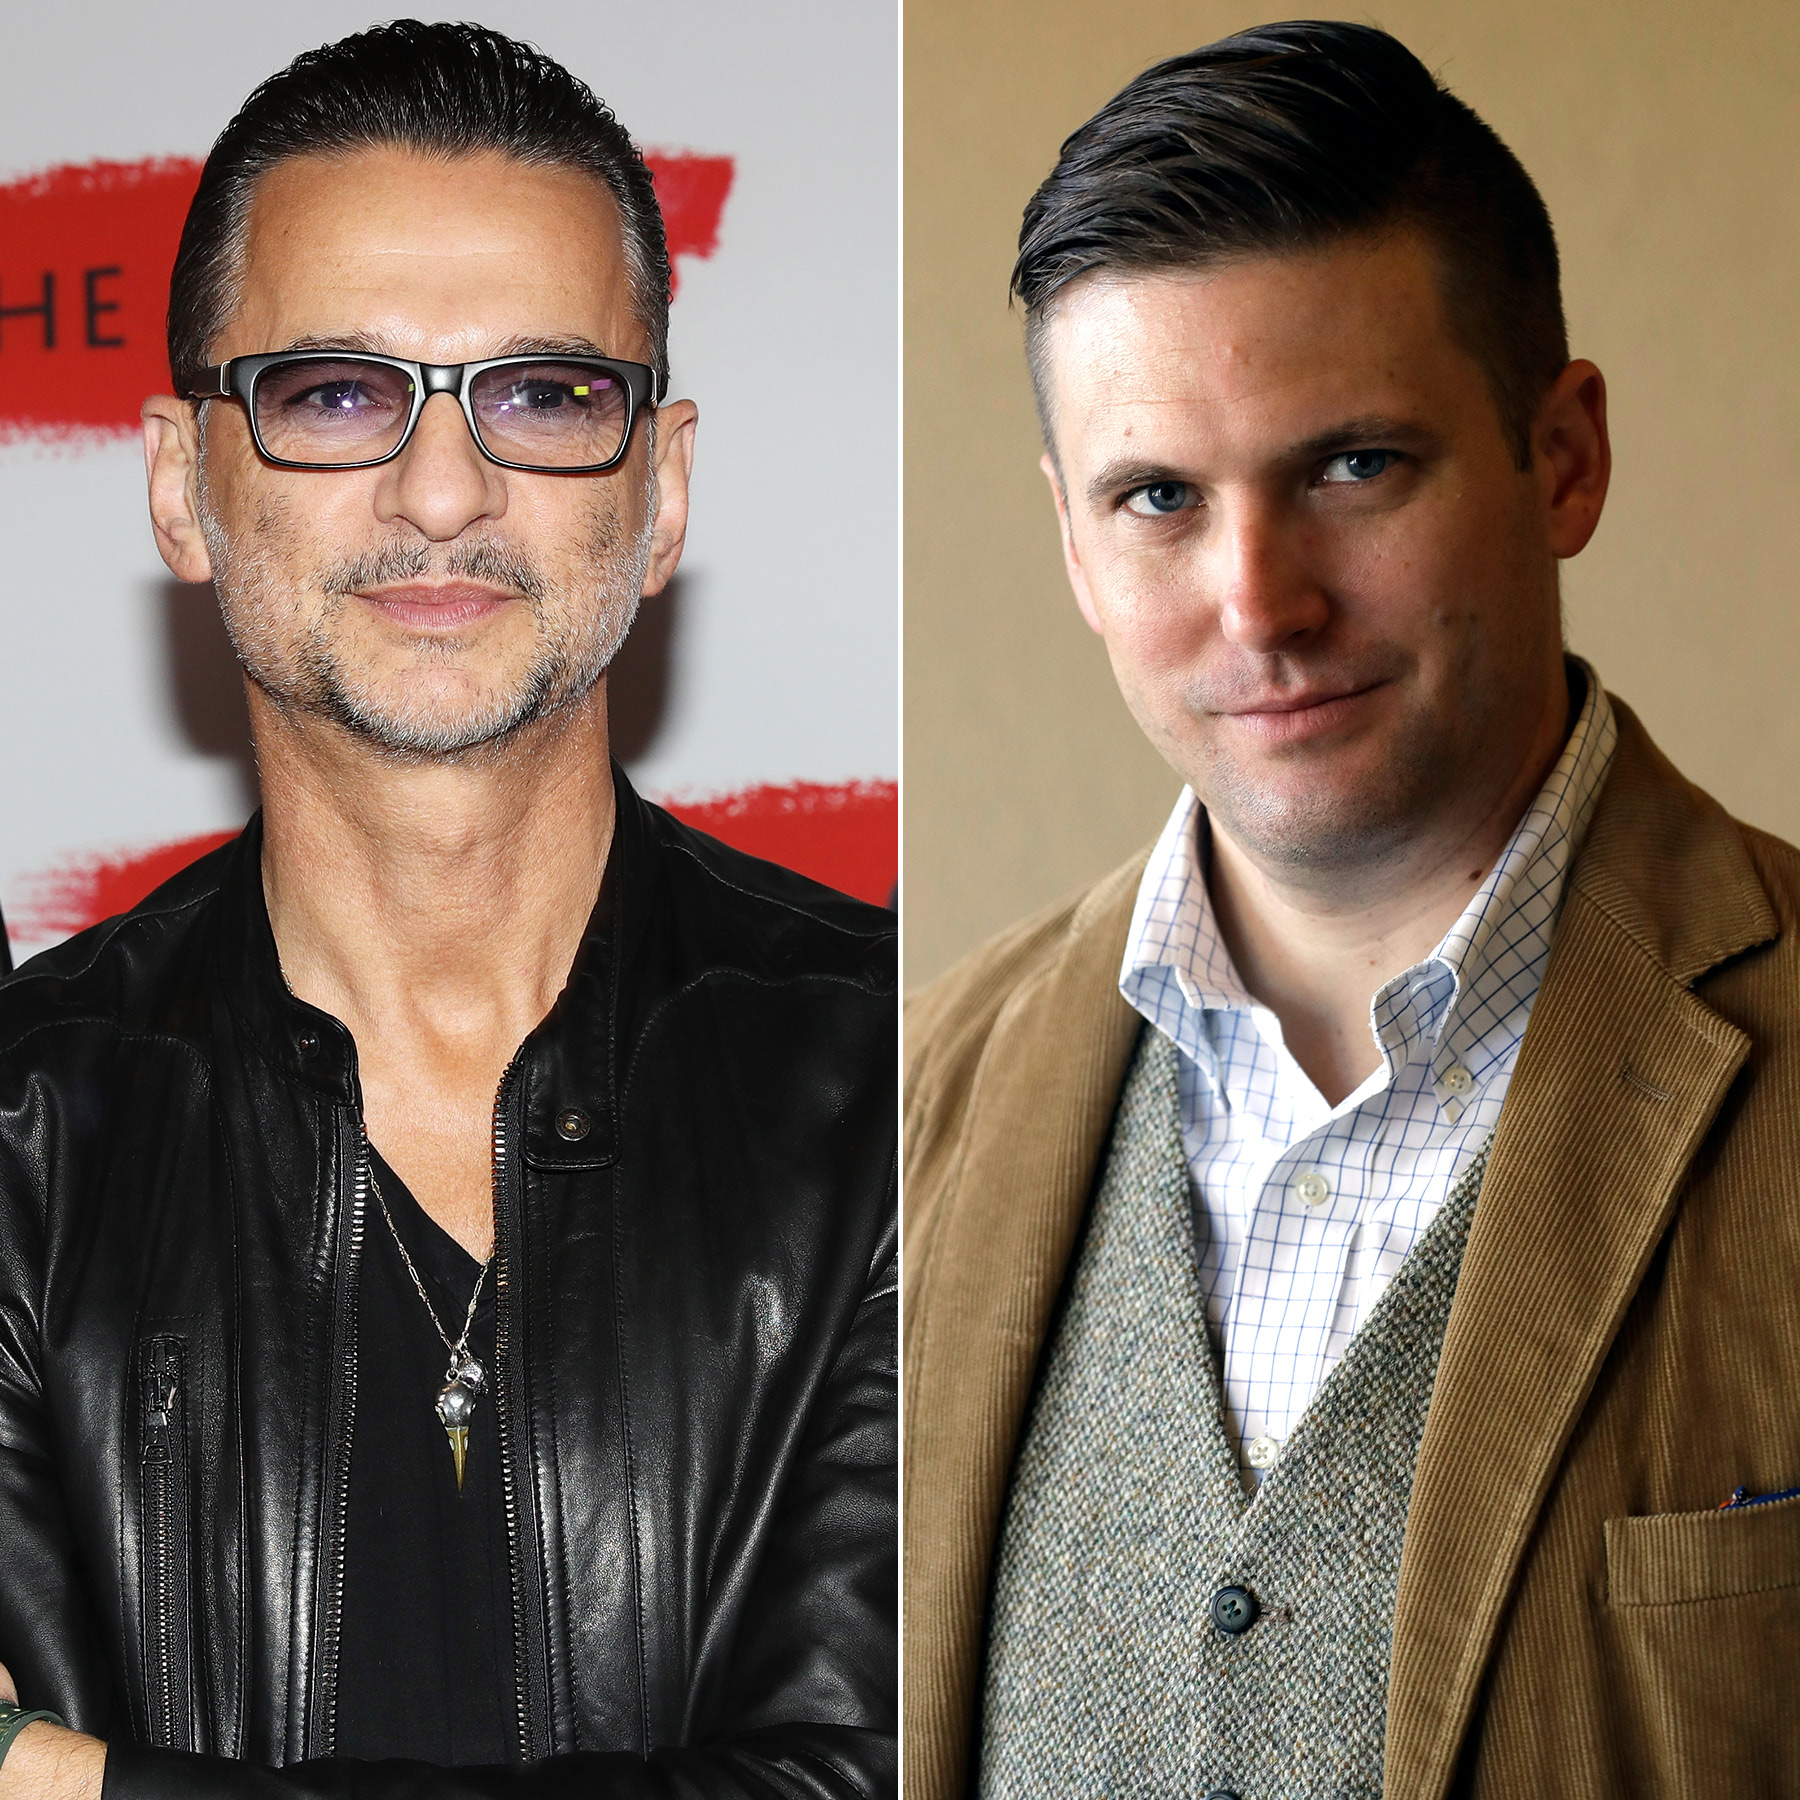 Depeche Mode and Richard Spencer